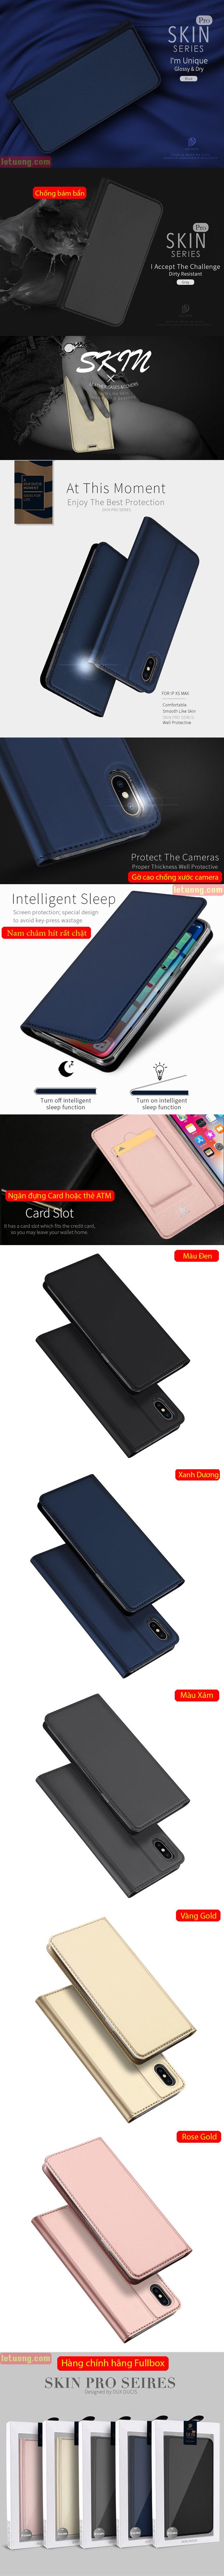 Bao da iPhone Xs Max Dux Ducis Skin khung mềm siêu mỏng 5